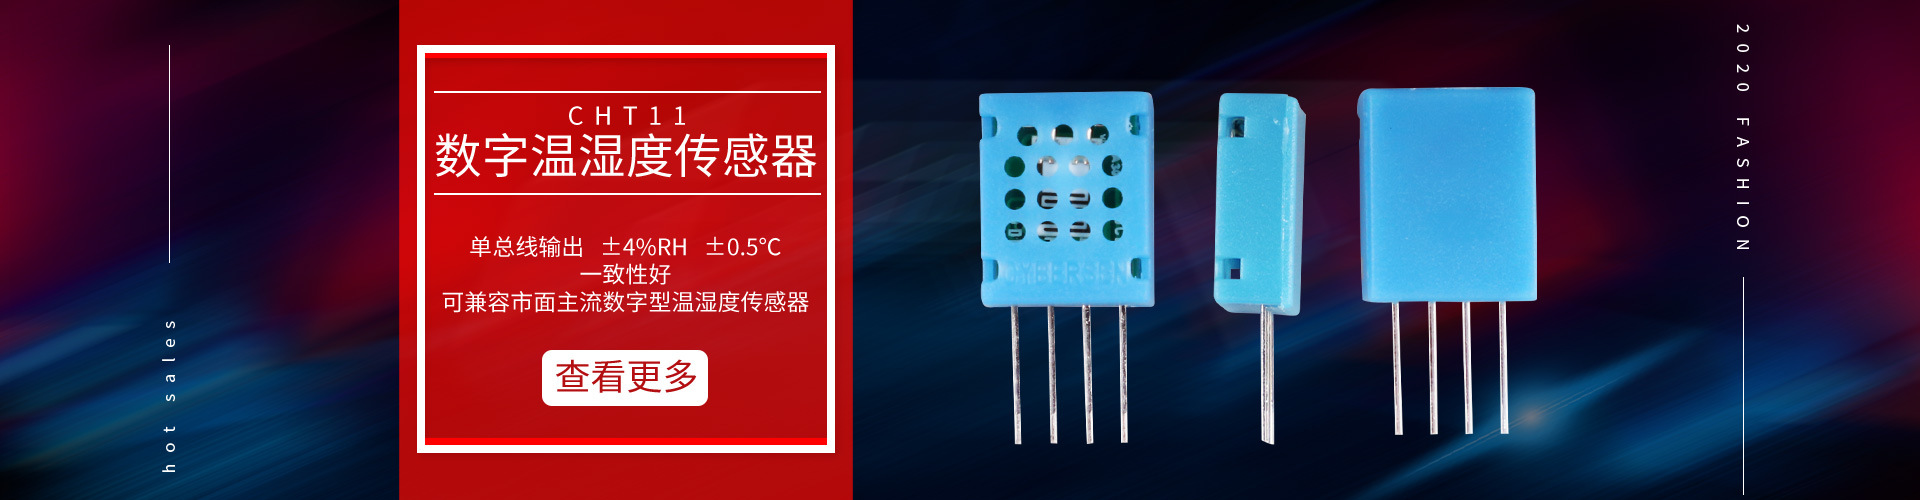 CHT11数字型温湿度传感器模块